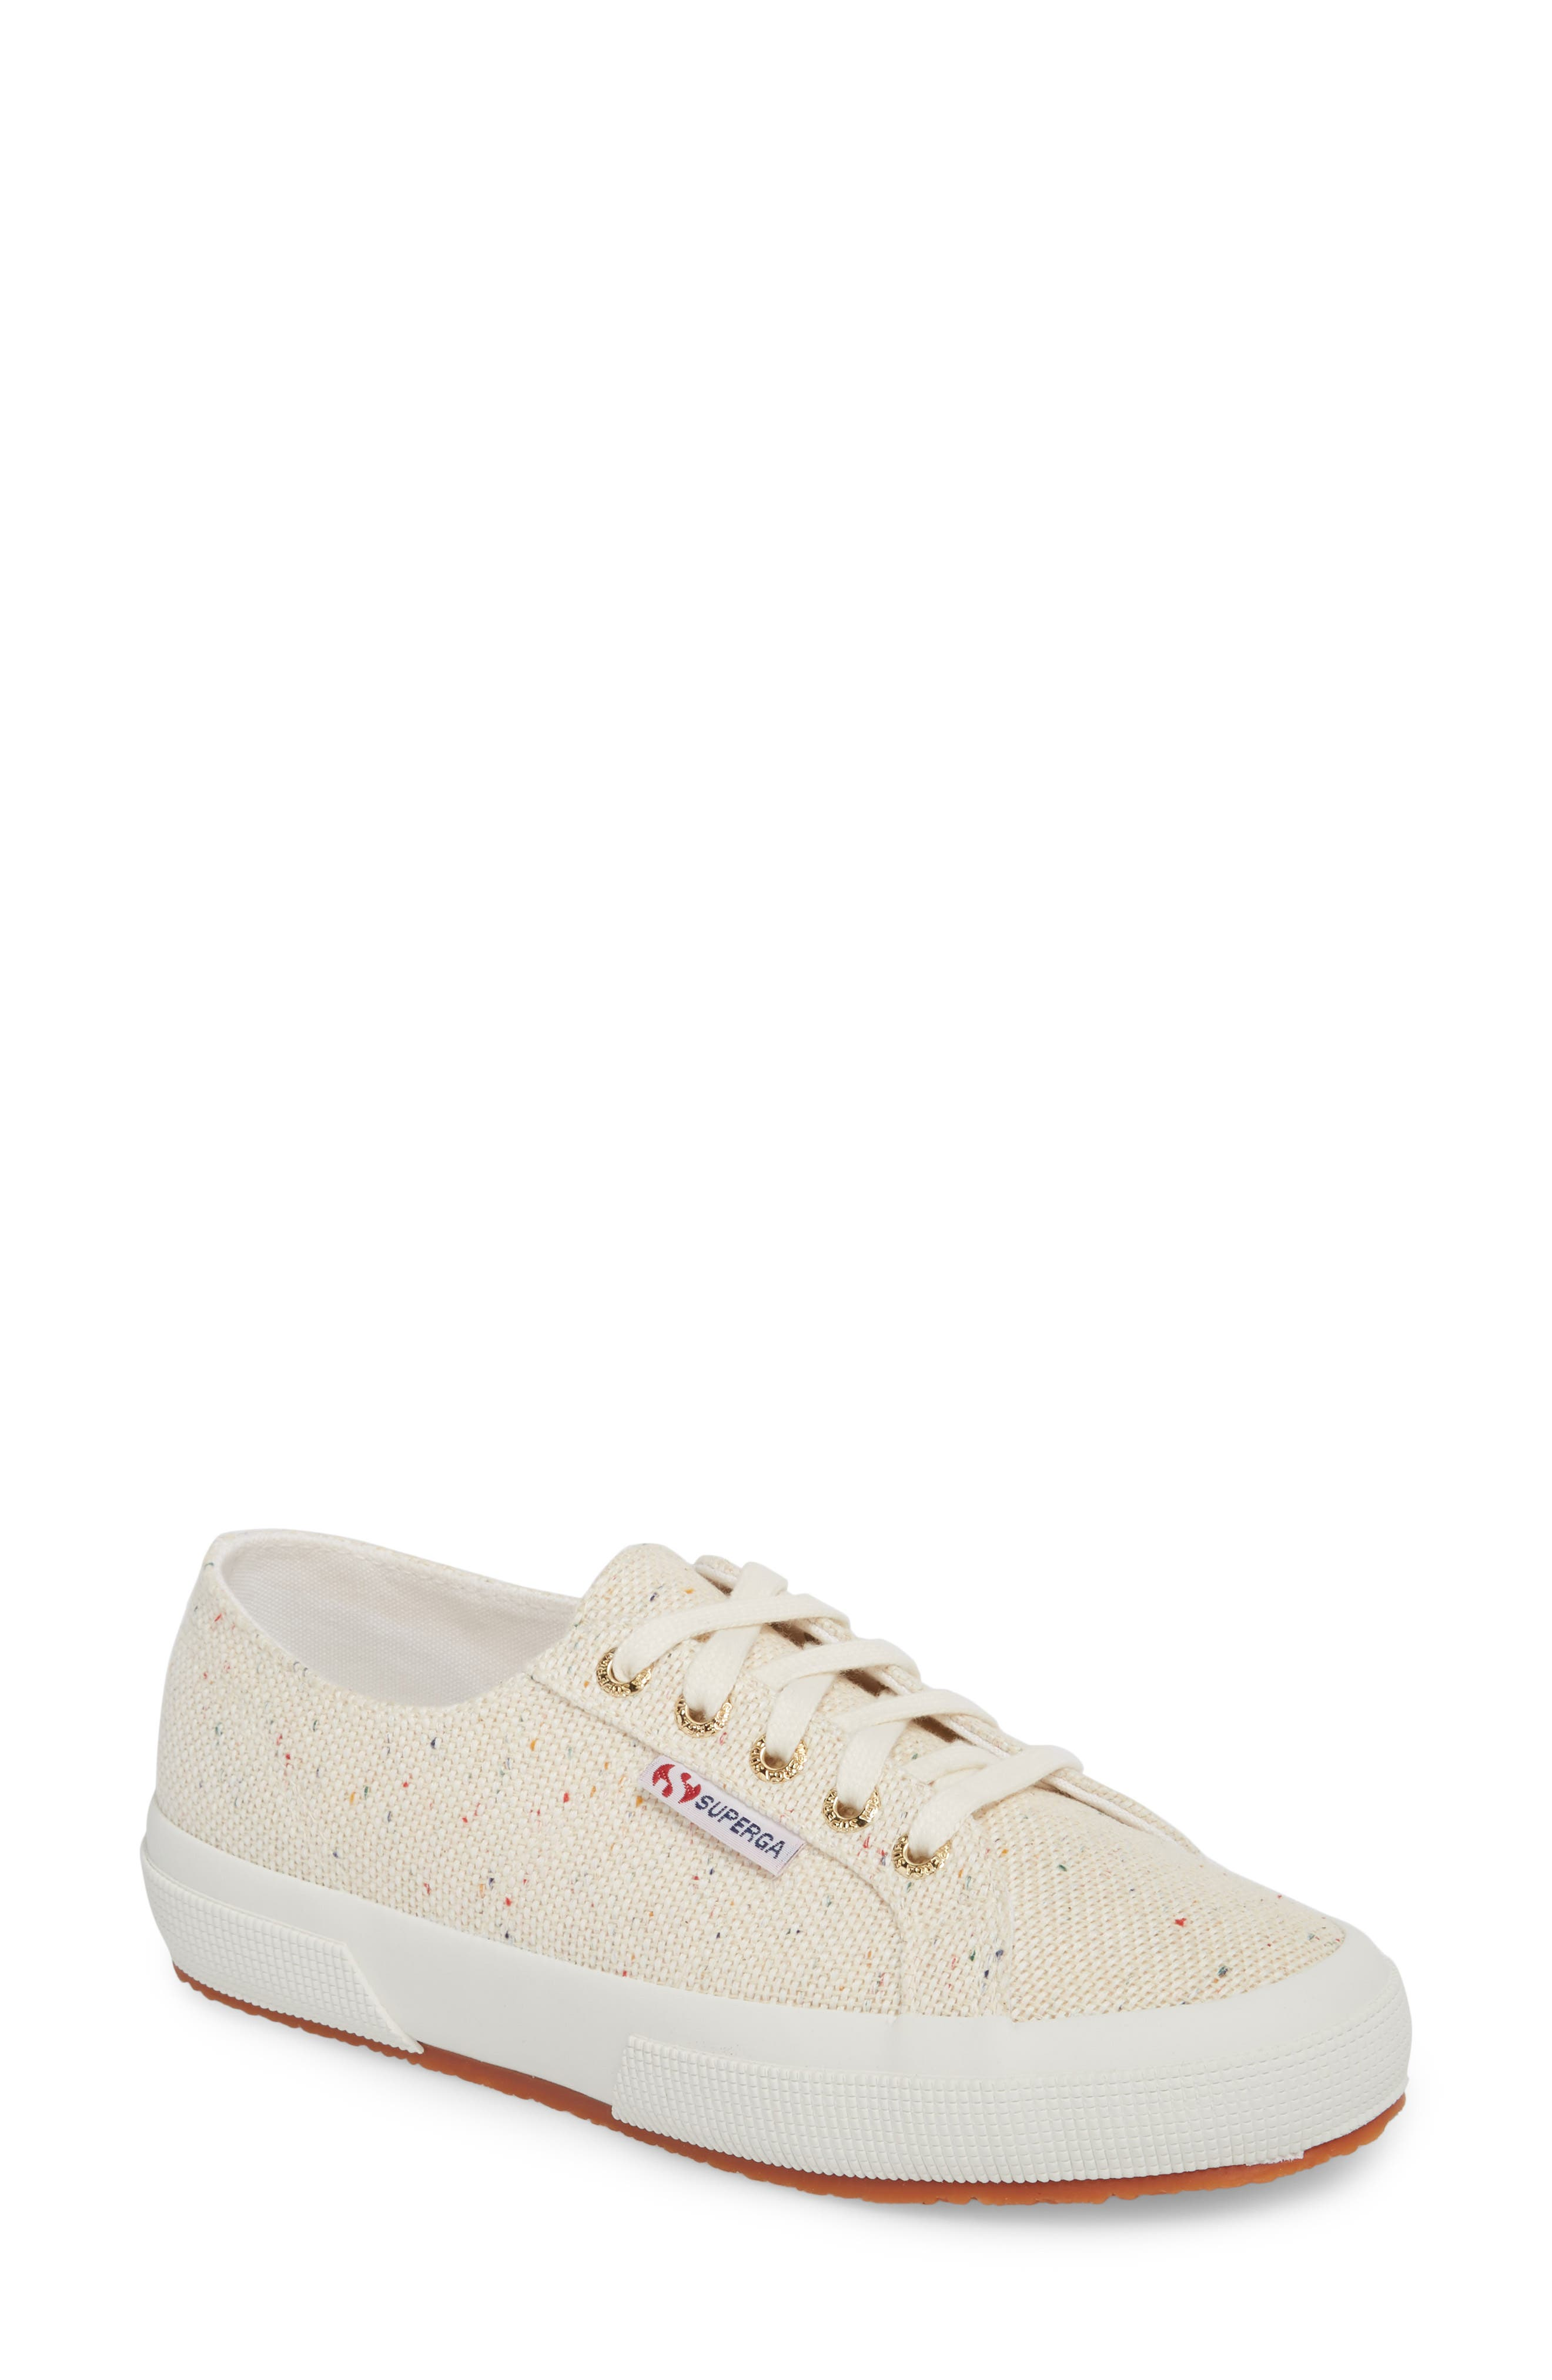 2750 Speckle Low Top Sneaker,                         Main,                         color, White Multi